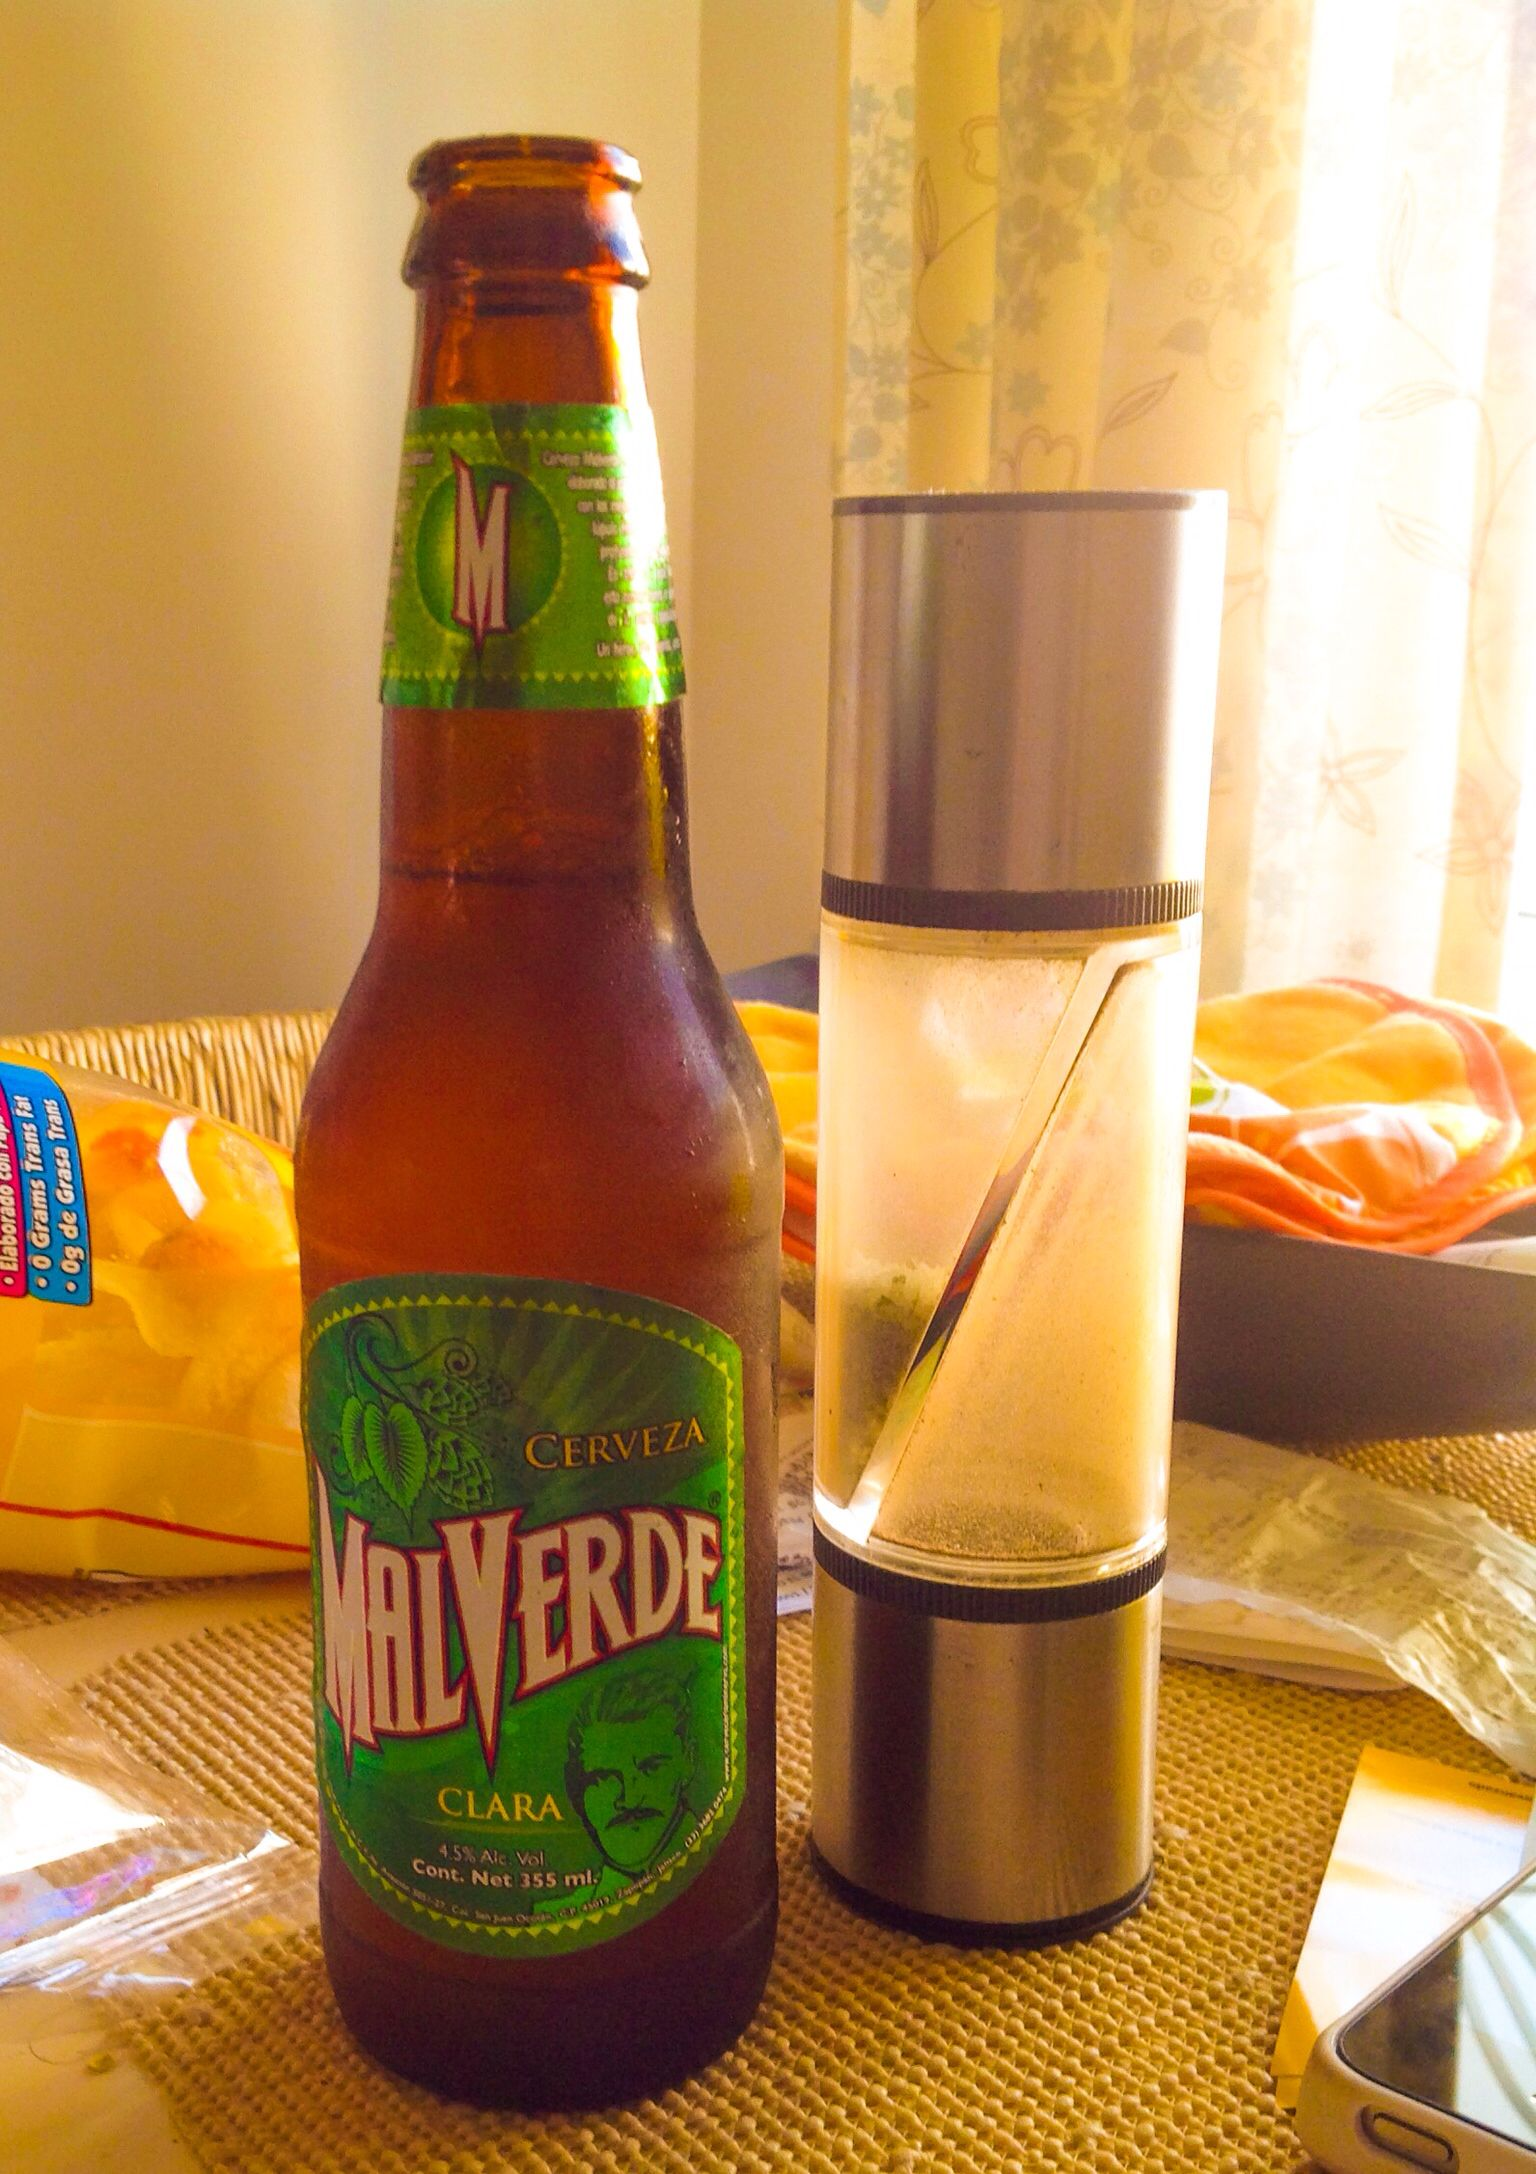 Malverde Pilsen Mexico Cerveza